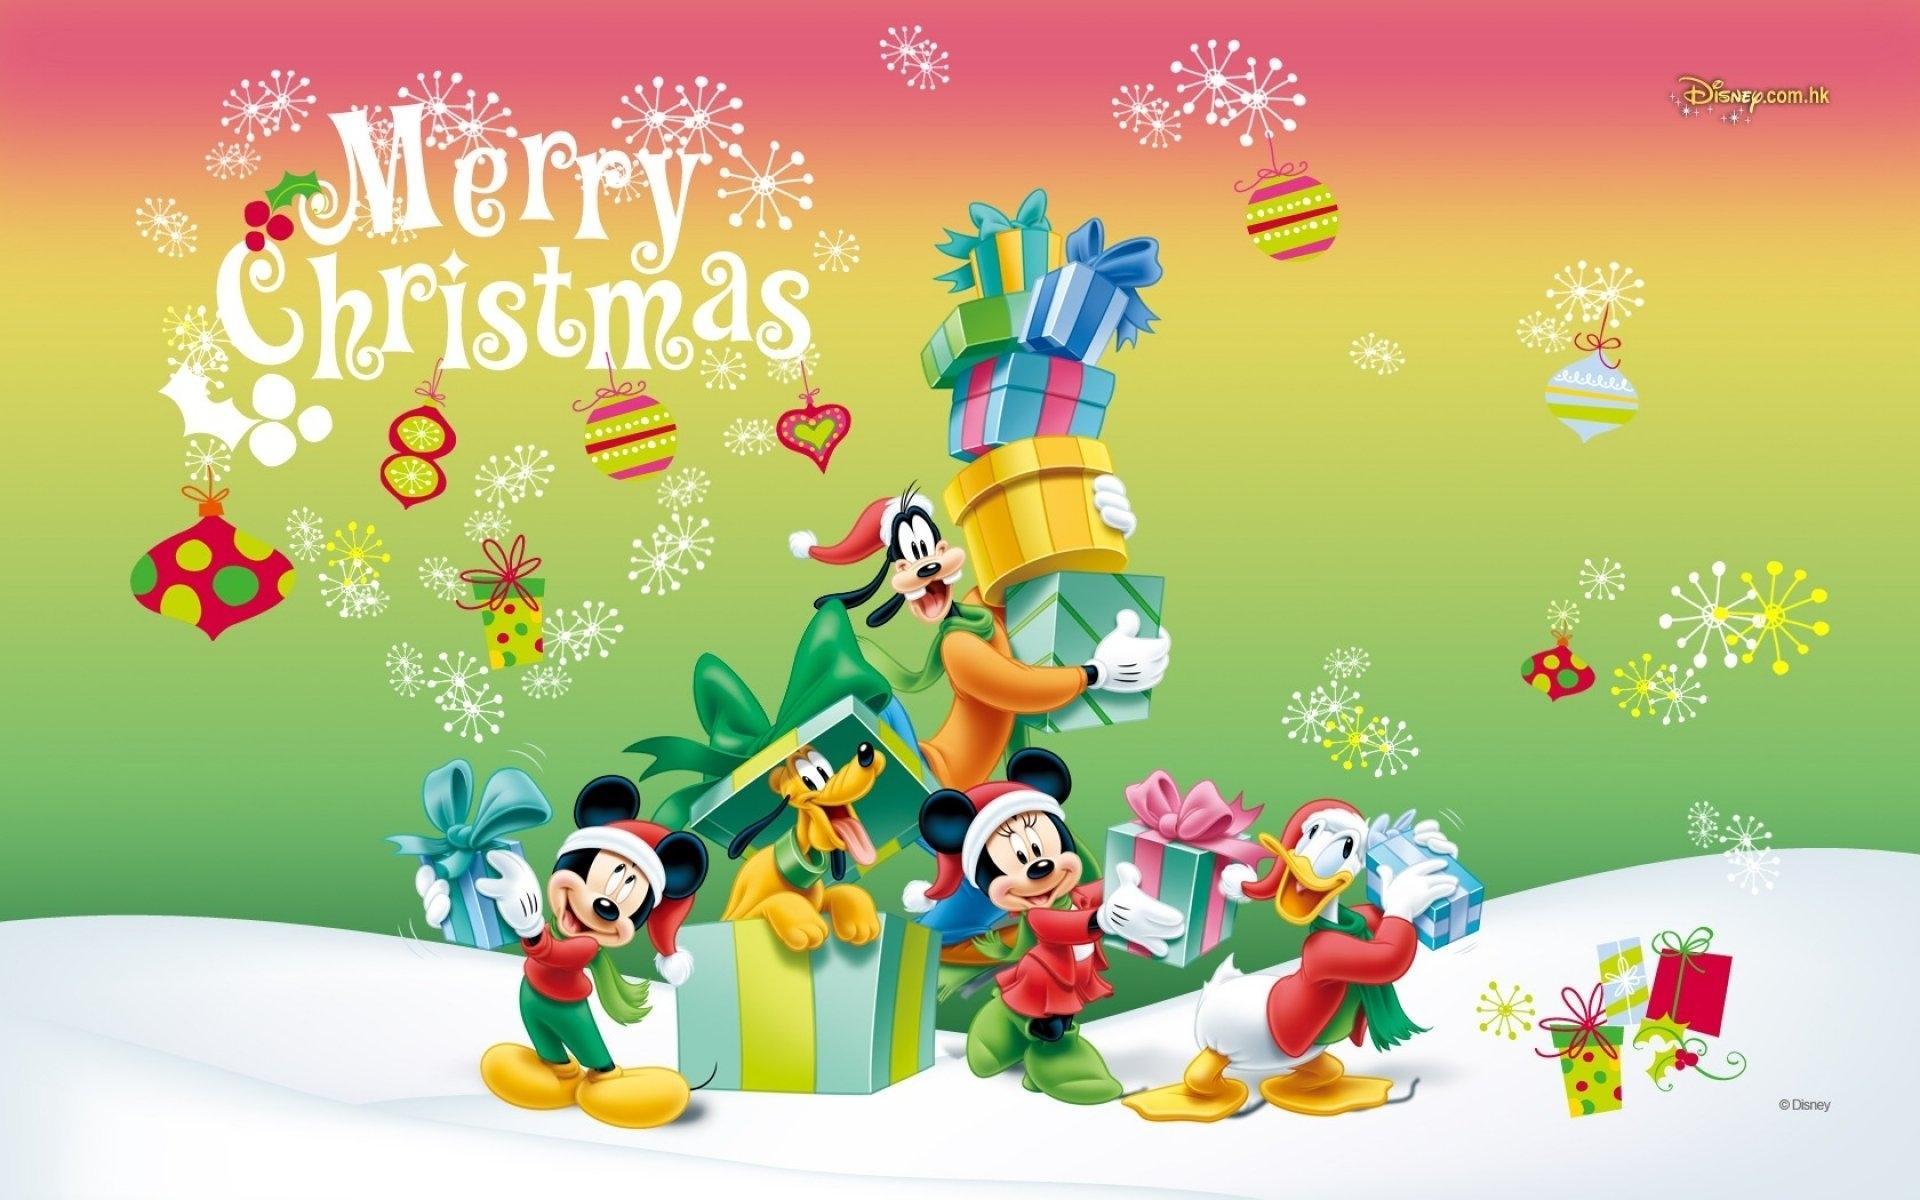 mickey mouse merry christmas wallpaper | wallpaperlepi